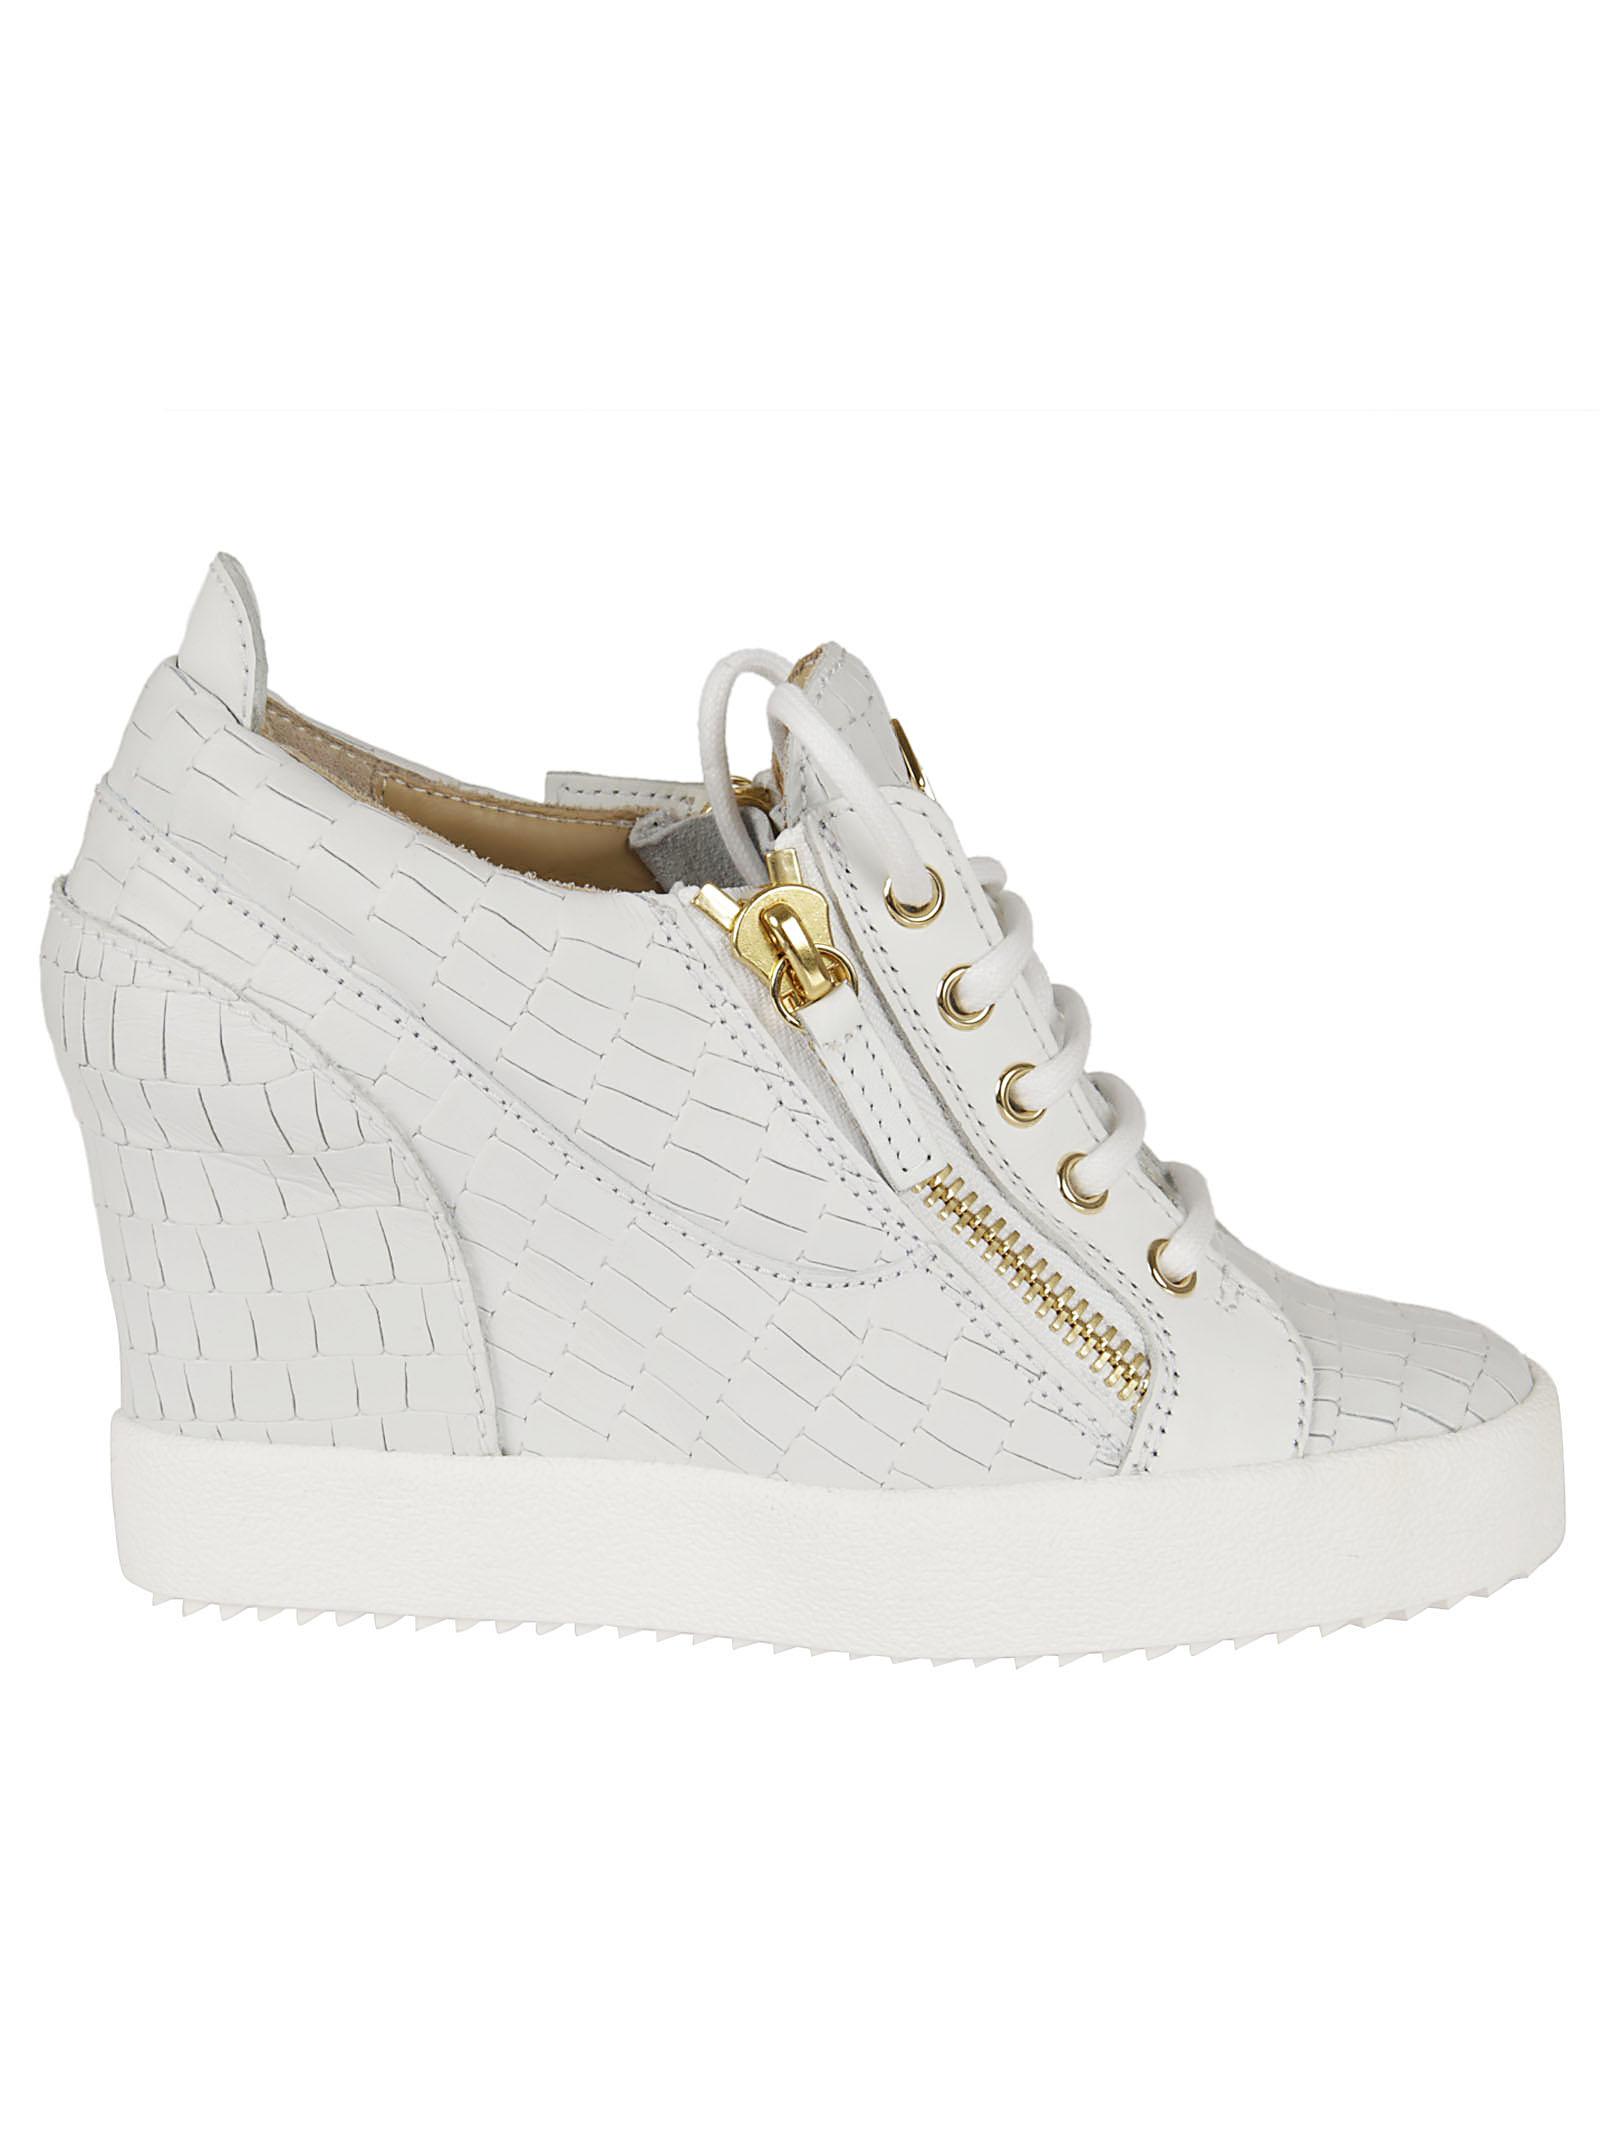 Giuseppe Zanotti Giuseppe Zanotti Crocodile Effect Hi-Top Wedge Sneakers